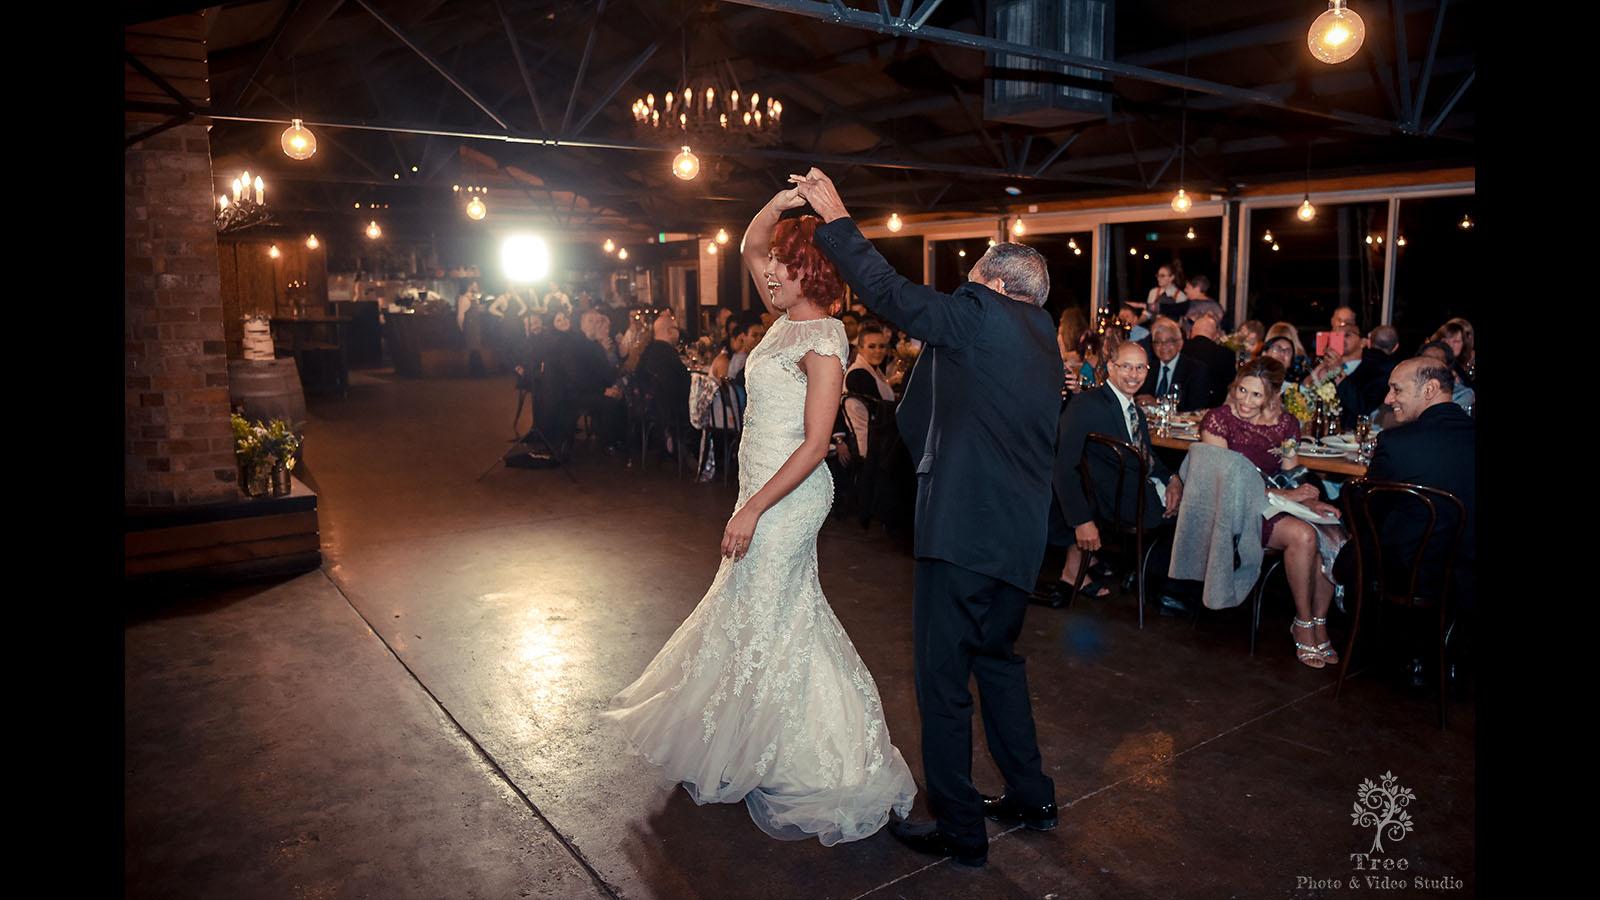 Zonzo Wedding Dancing 7